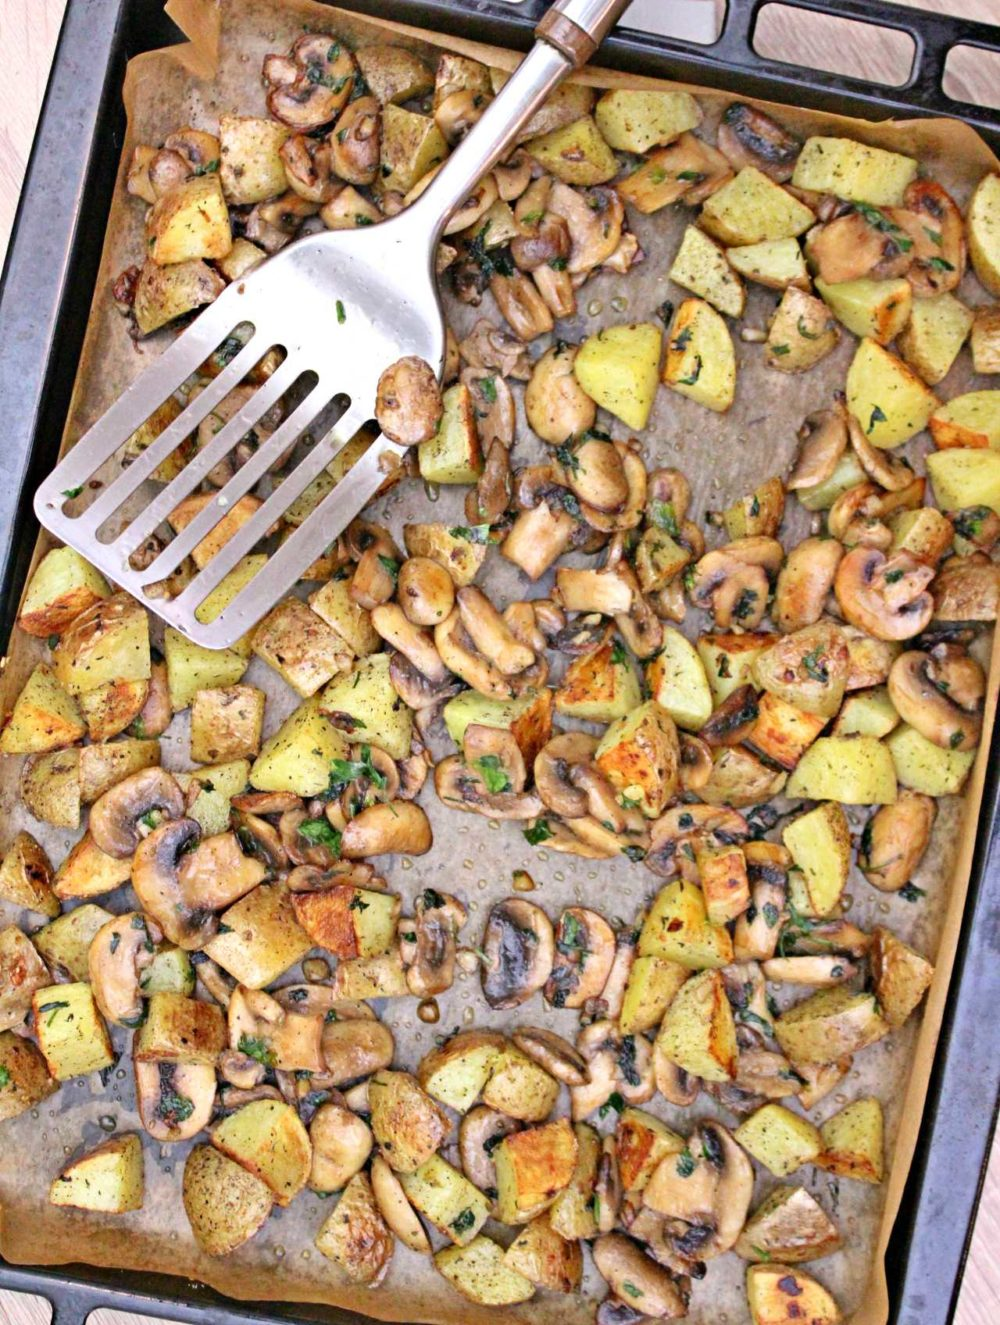 potatoes and mushrooms